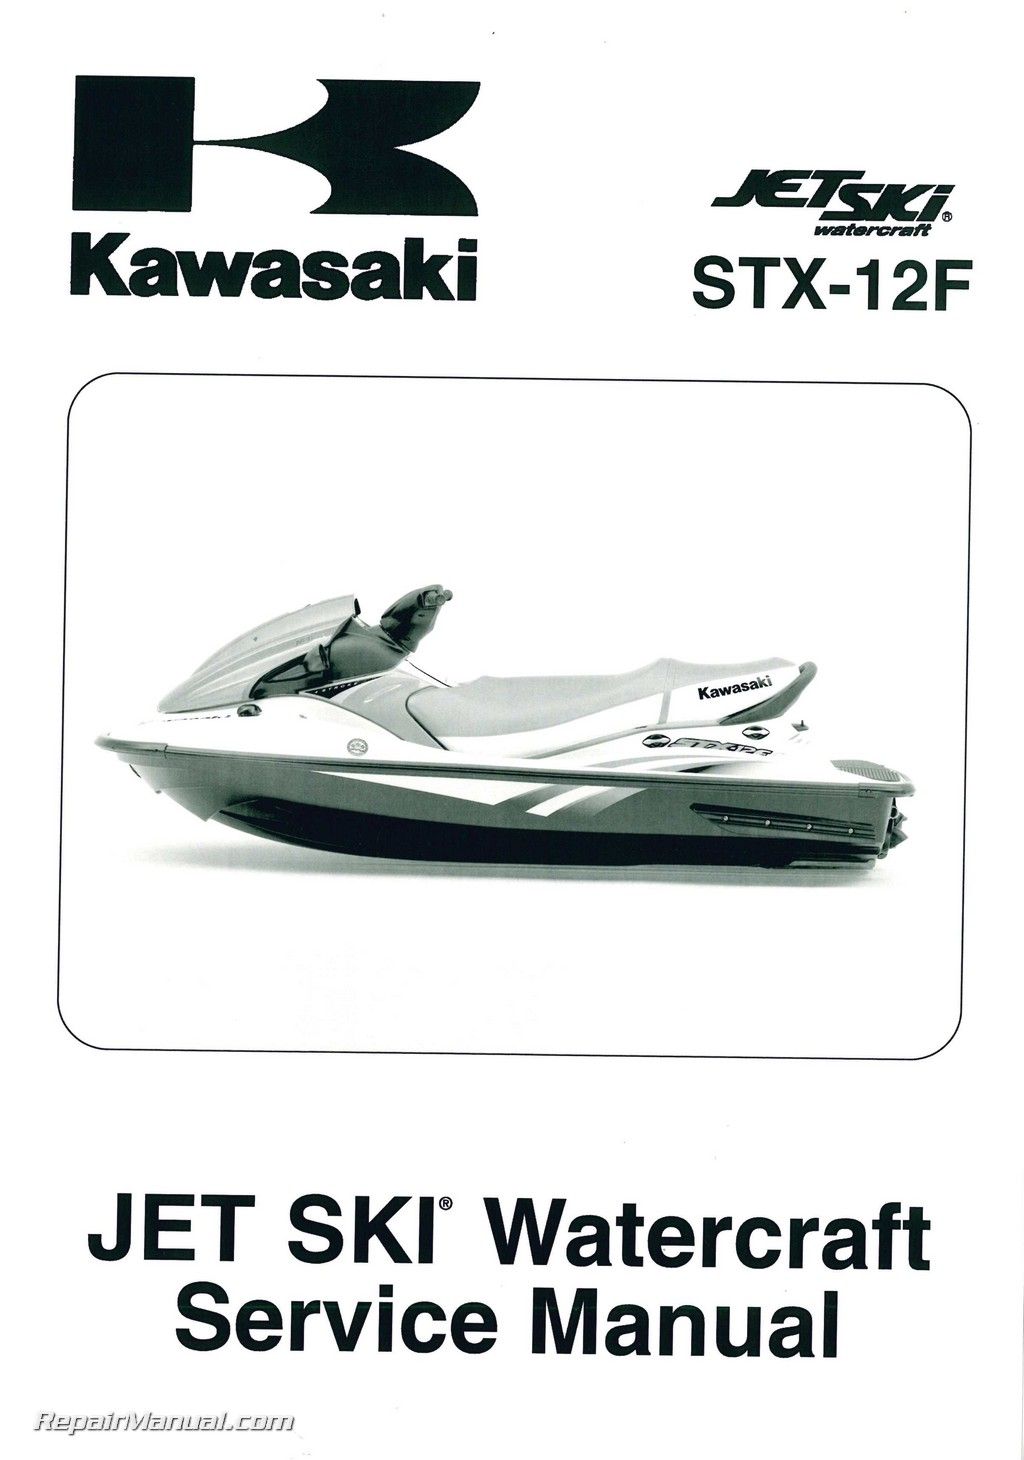 jet ski watercraft service manual stx-12f jt1200 2005 2006 2007